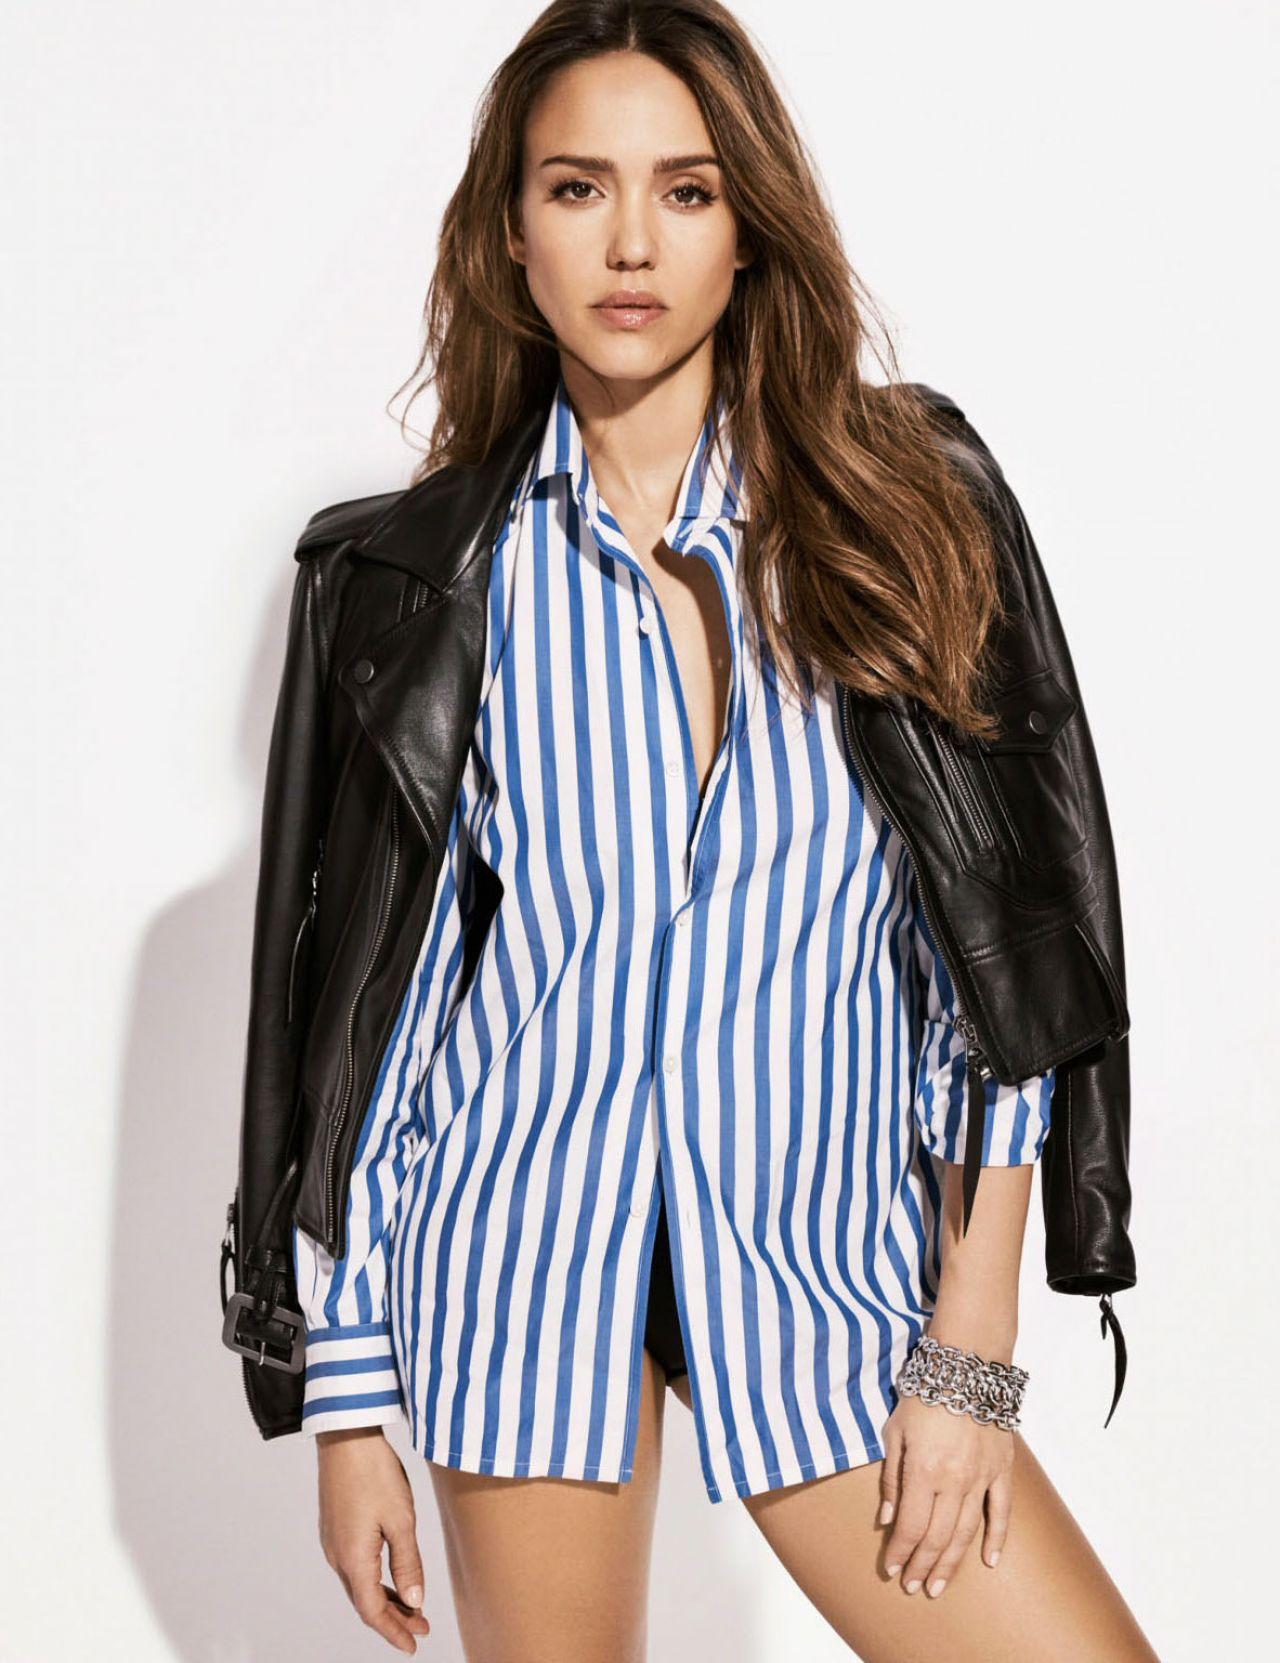 Jessica Alba - Cosmopolitan Magazine UK September 2017 Issue